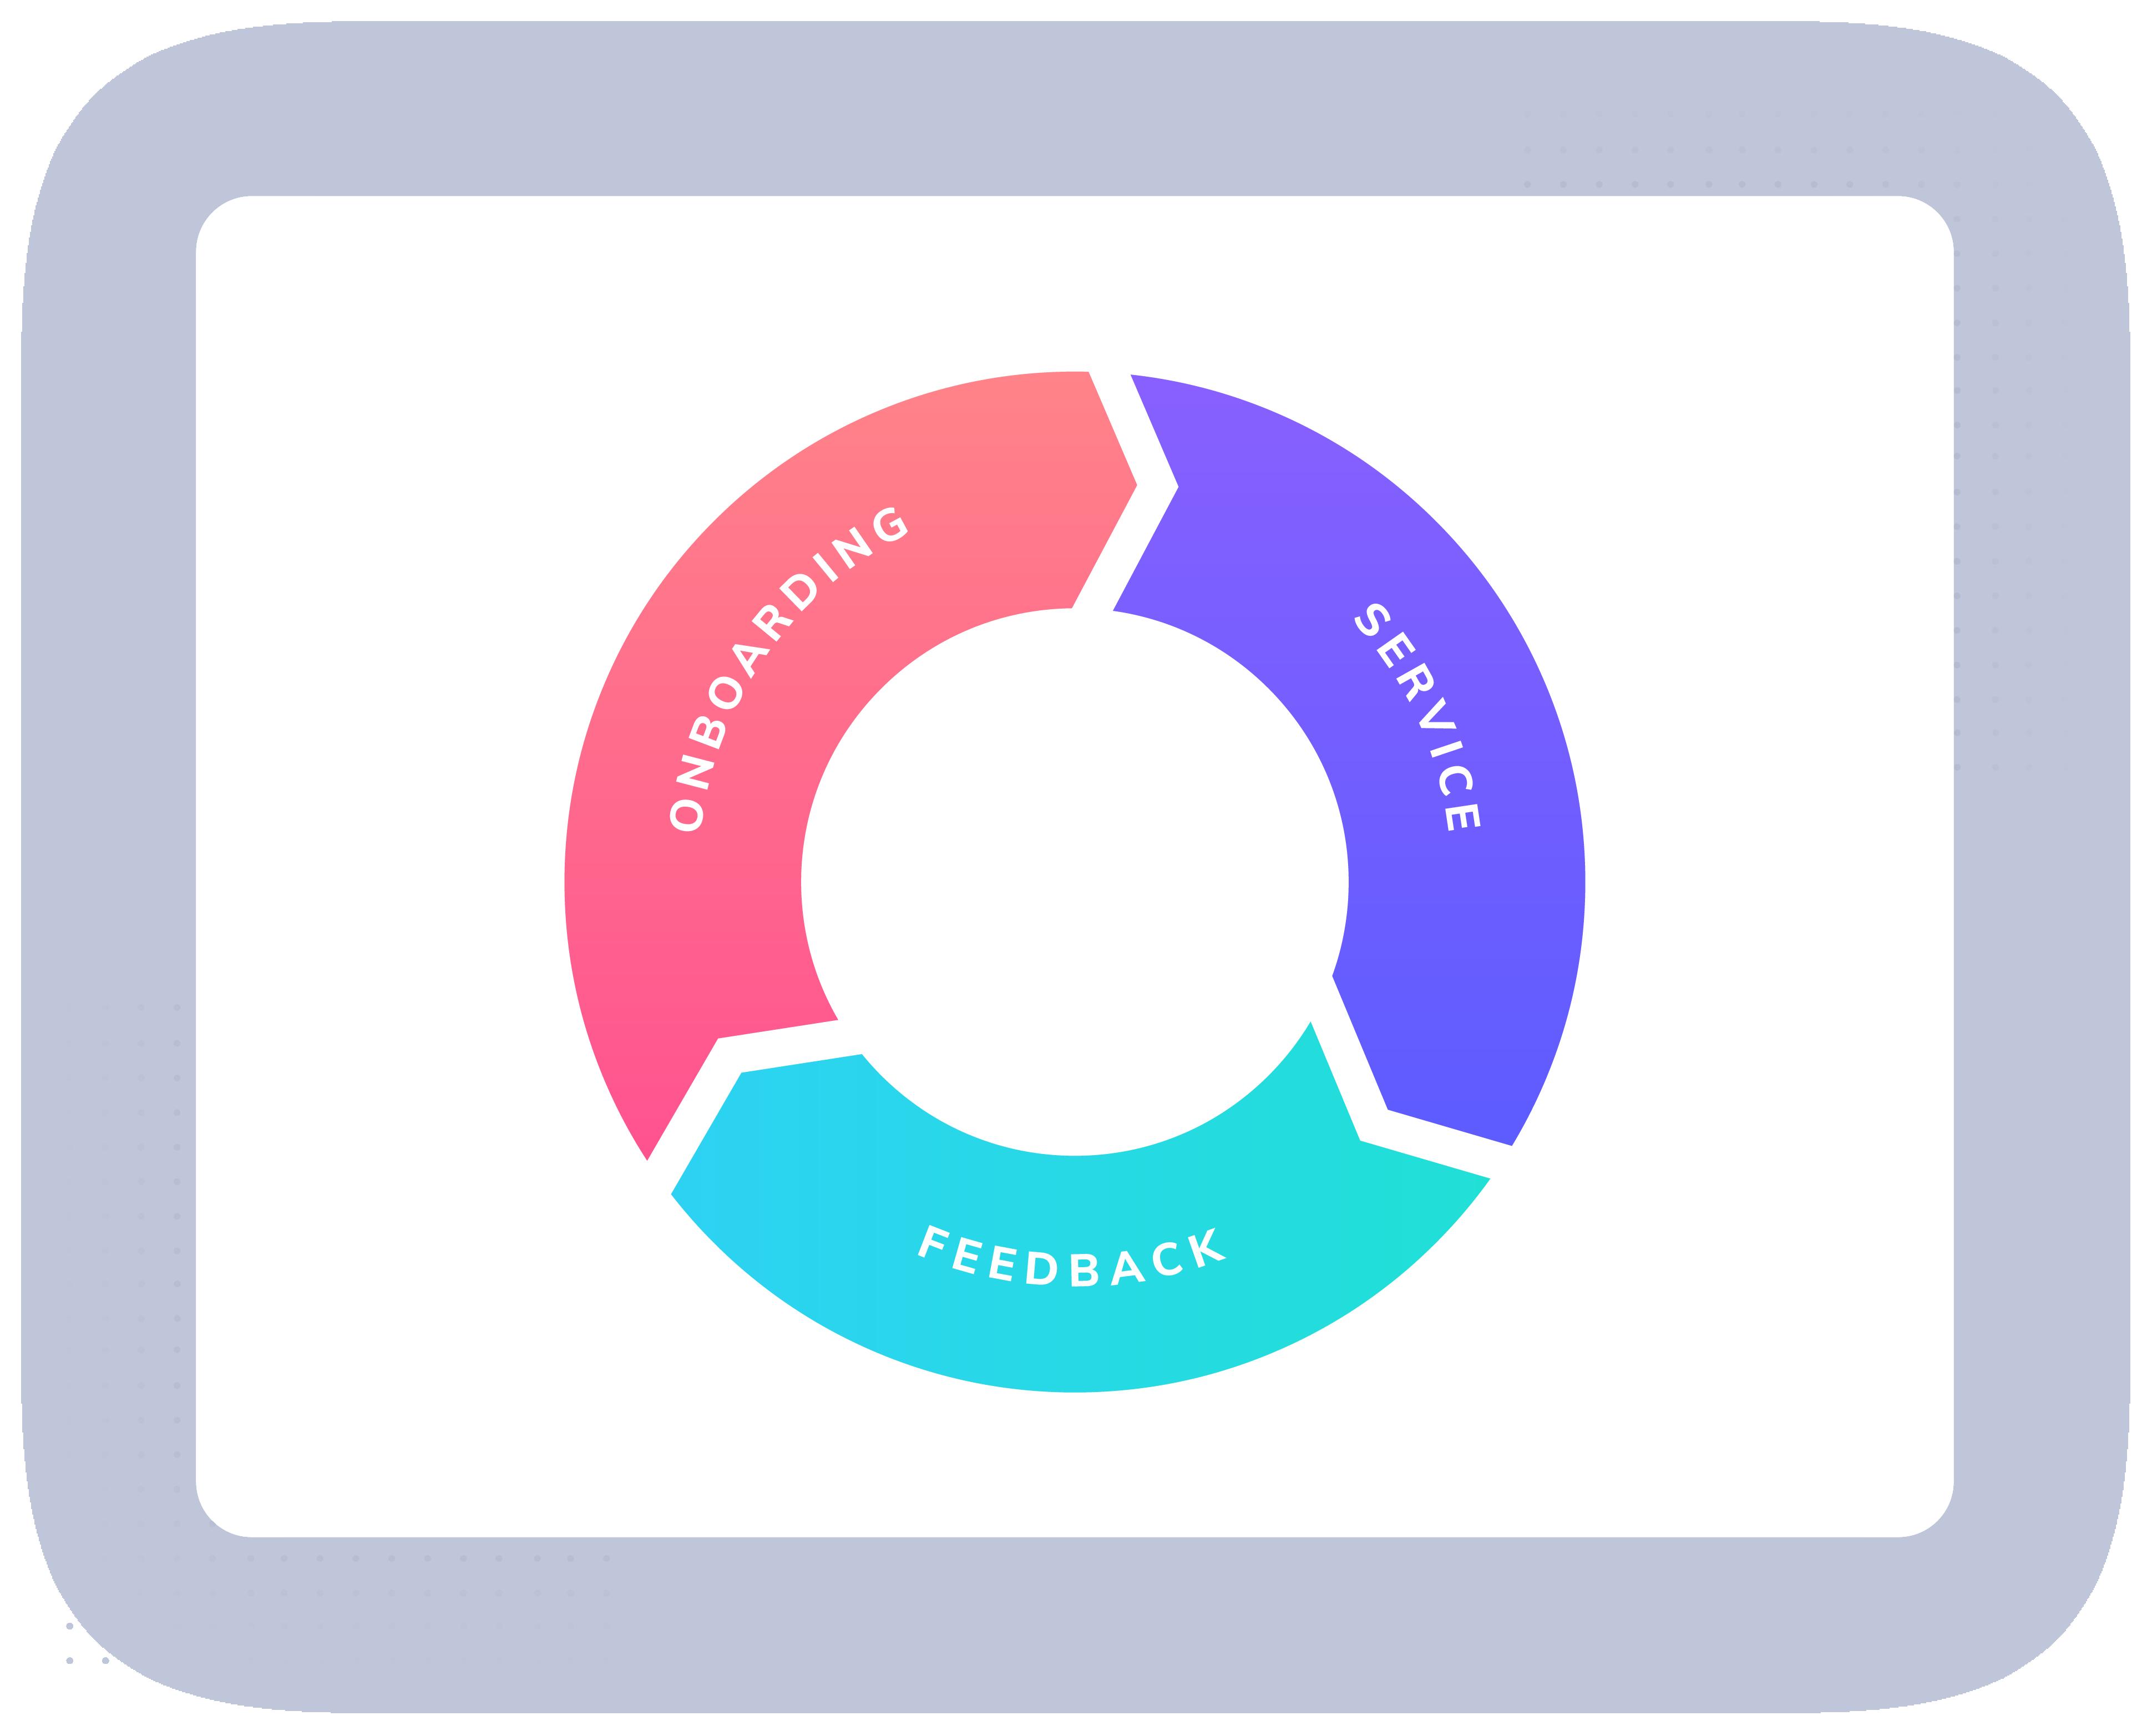 Product Adoption Strategy Flywheel